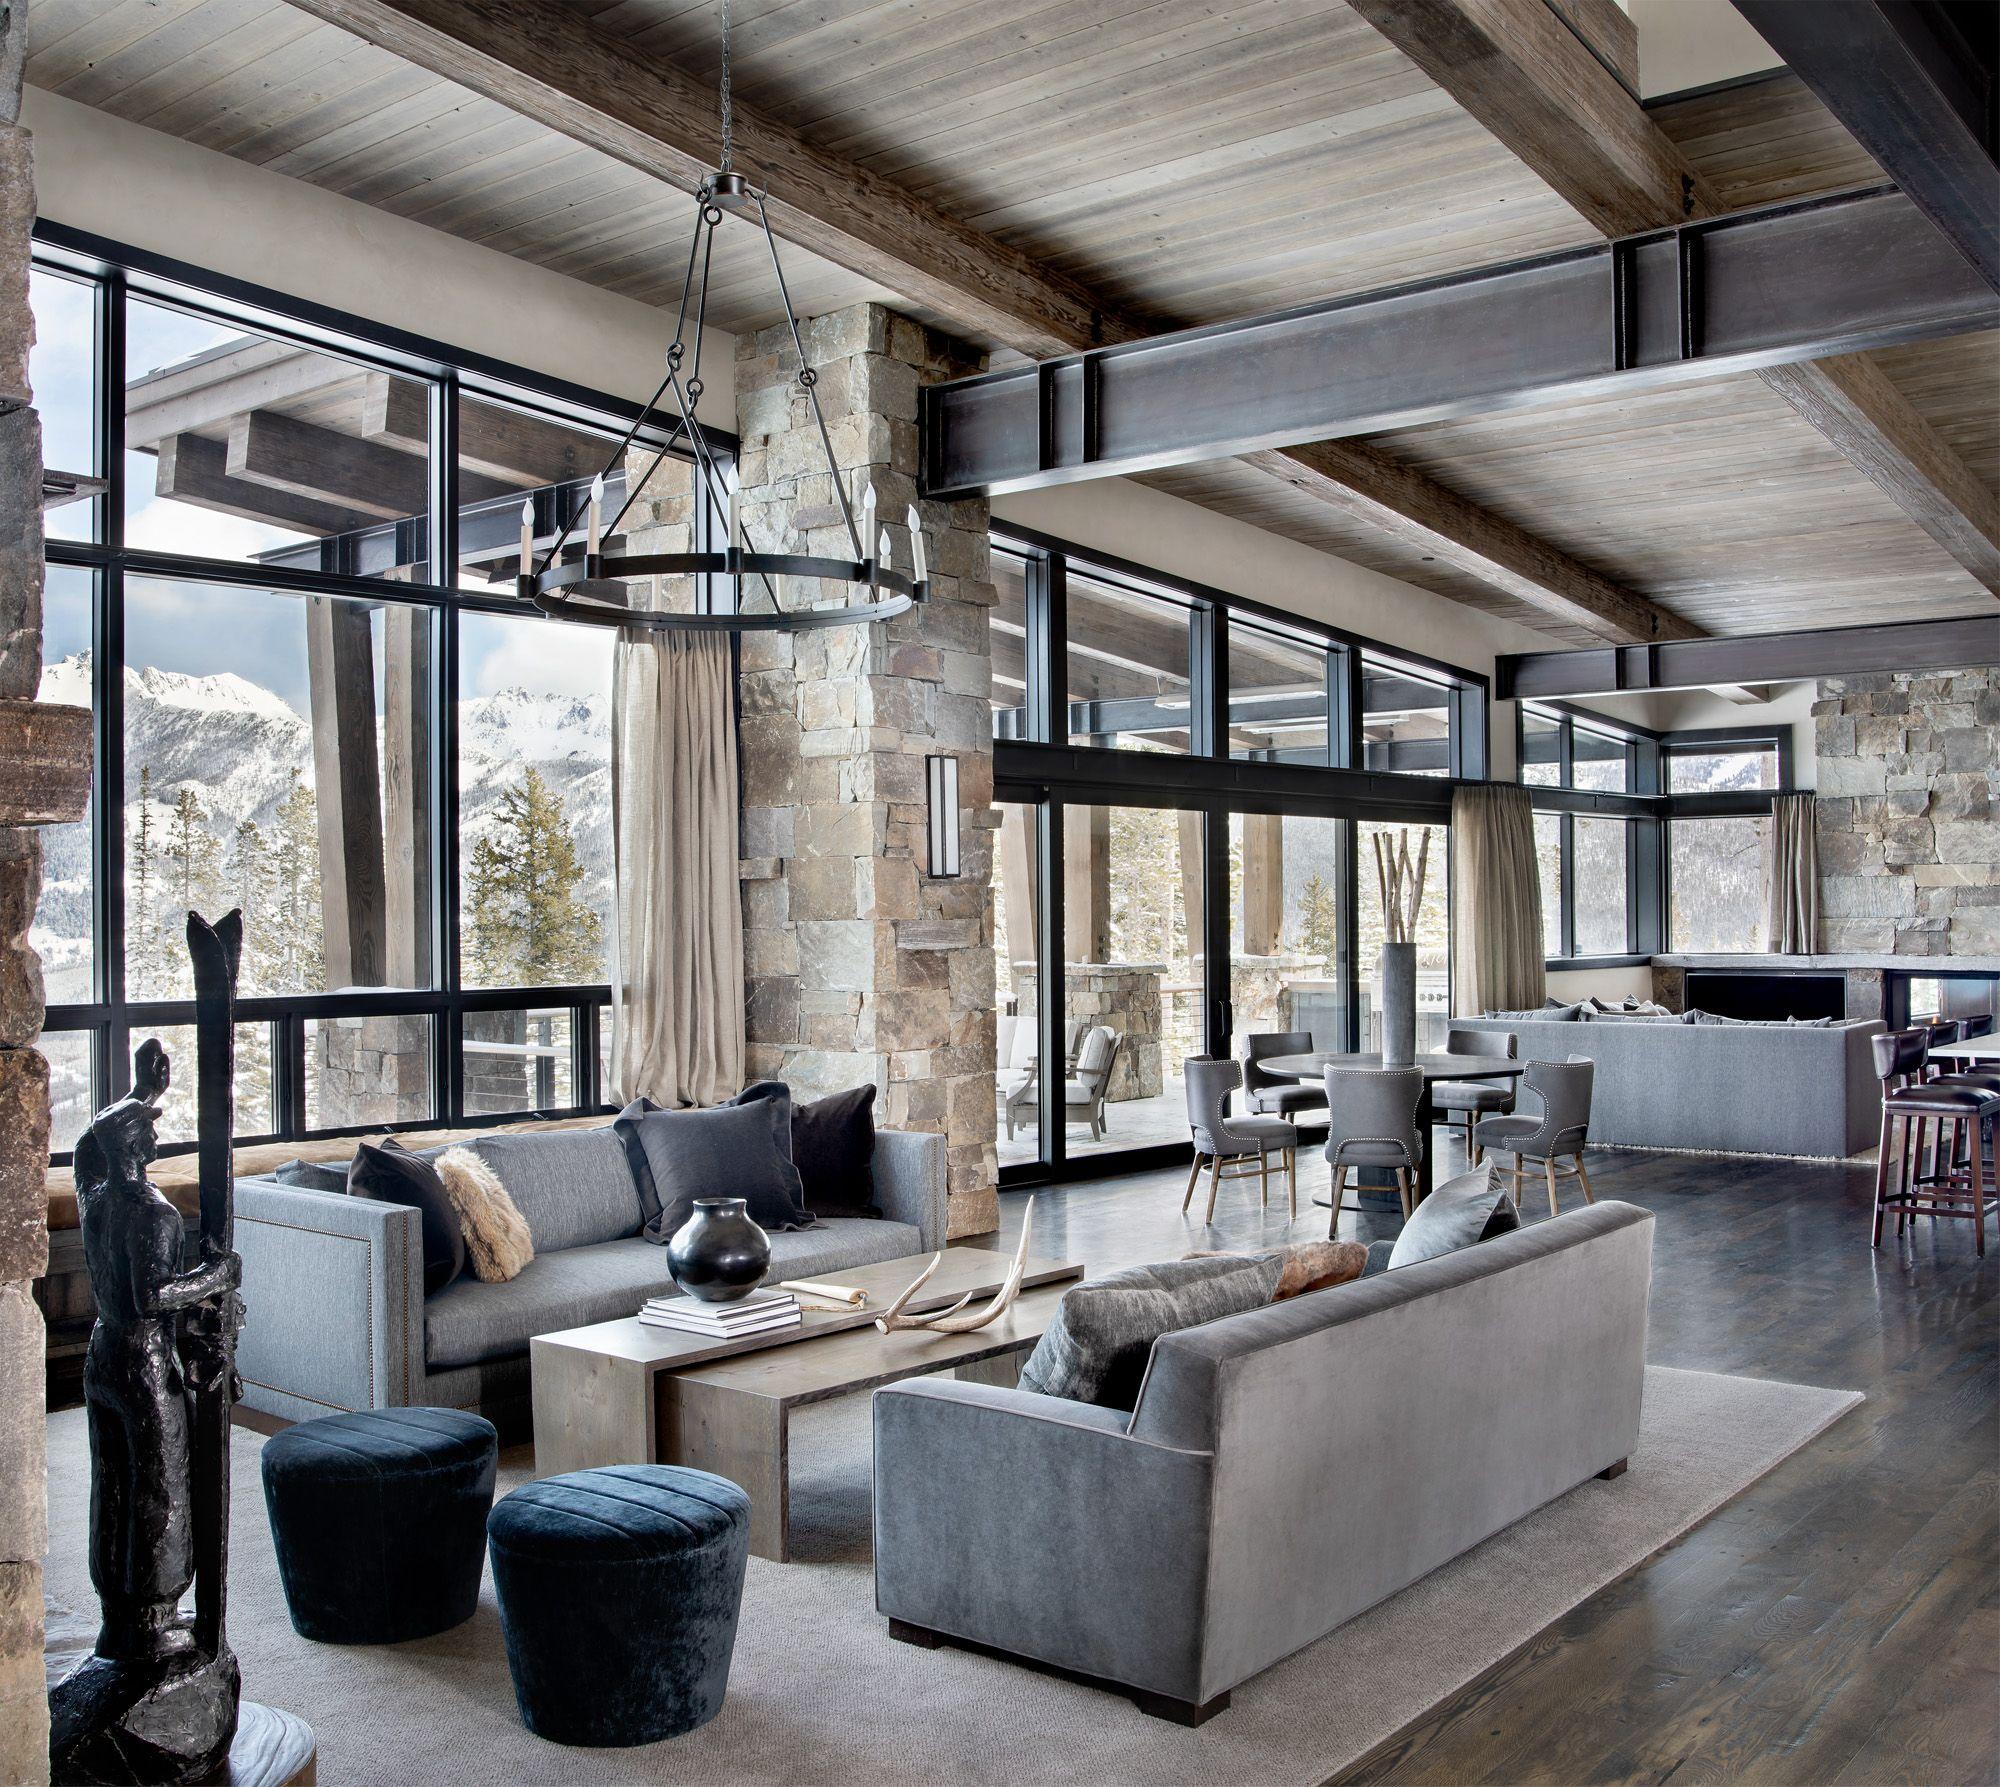 Freddie Mo Moonlight Basin Big Sky Montana With Images Mountain Home Interiors Elegant Living Room Design Modern Mountain Home